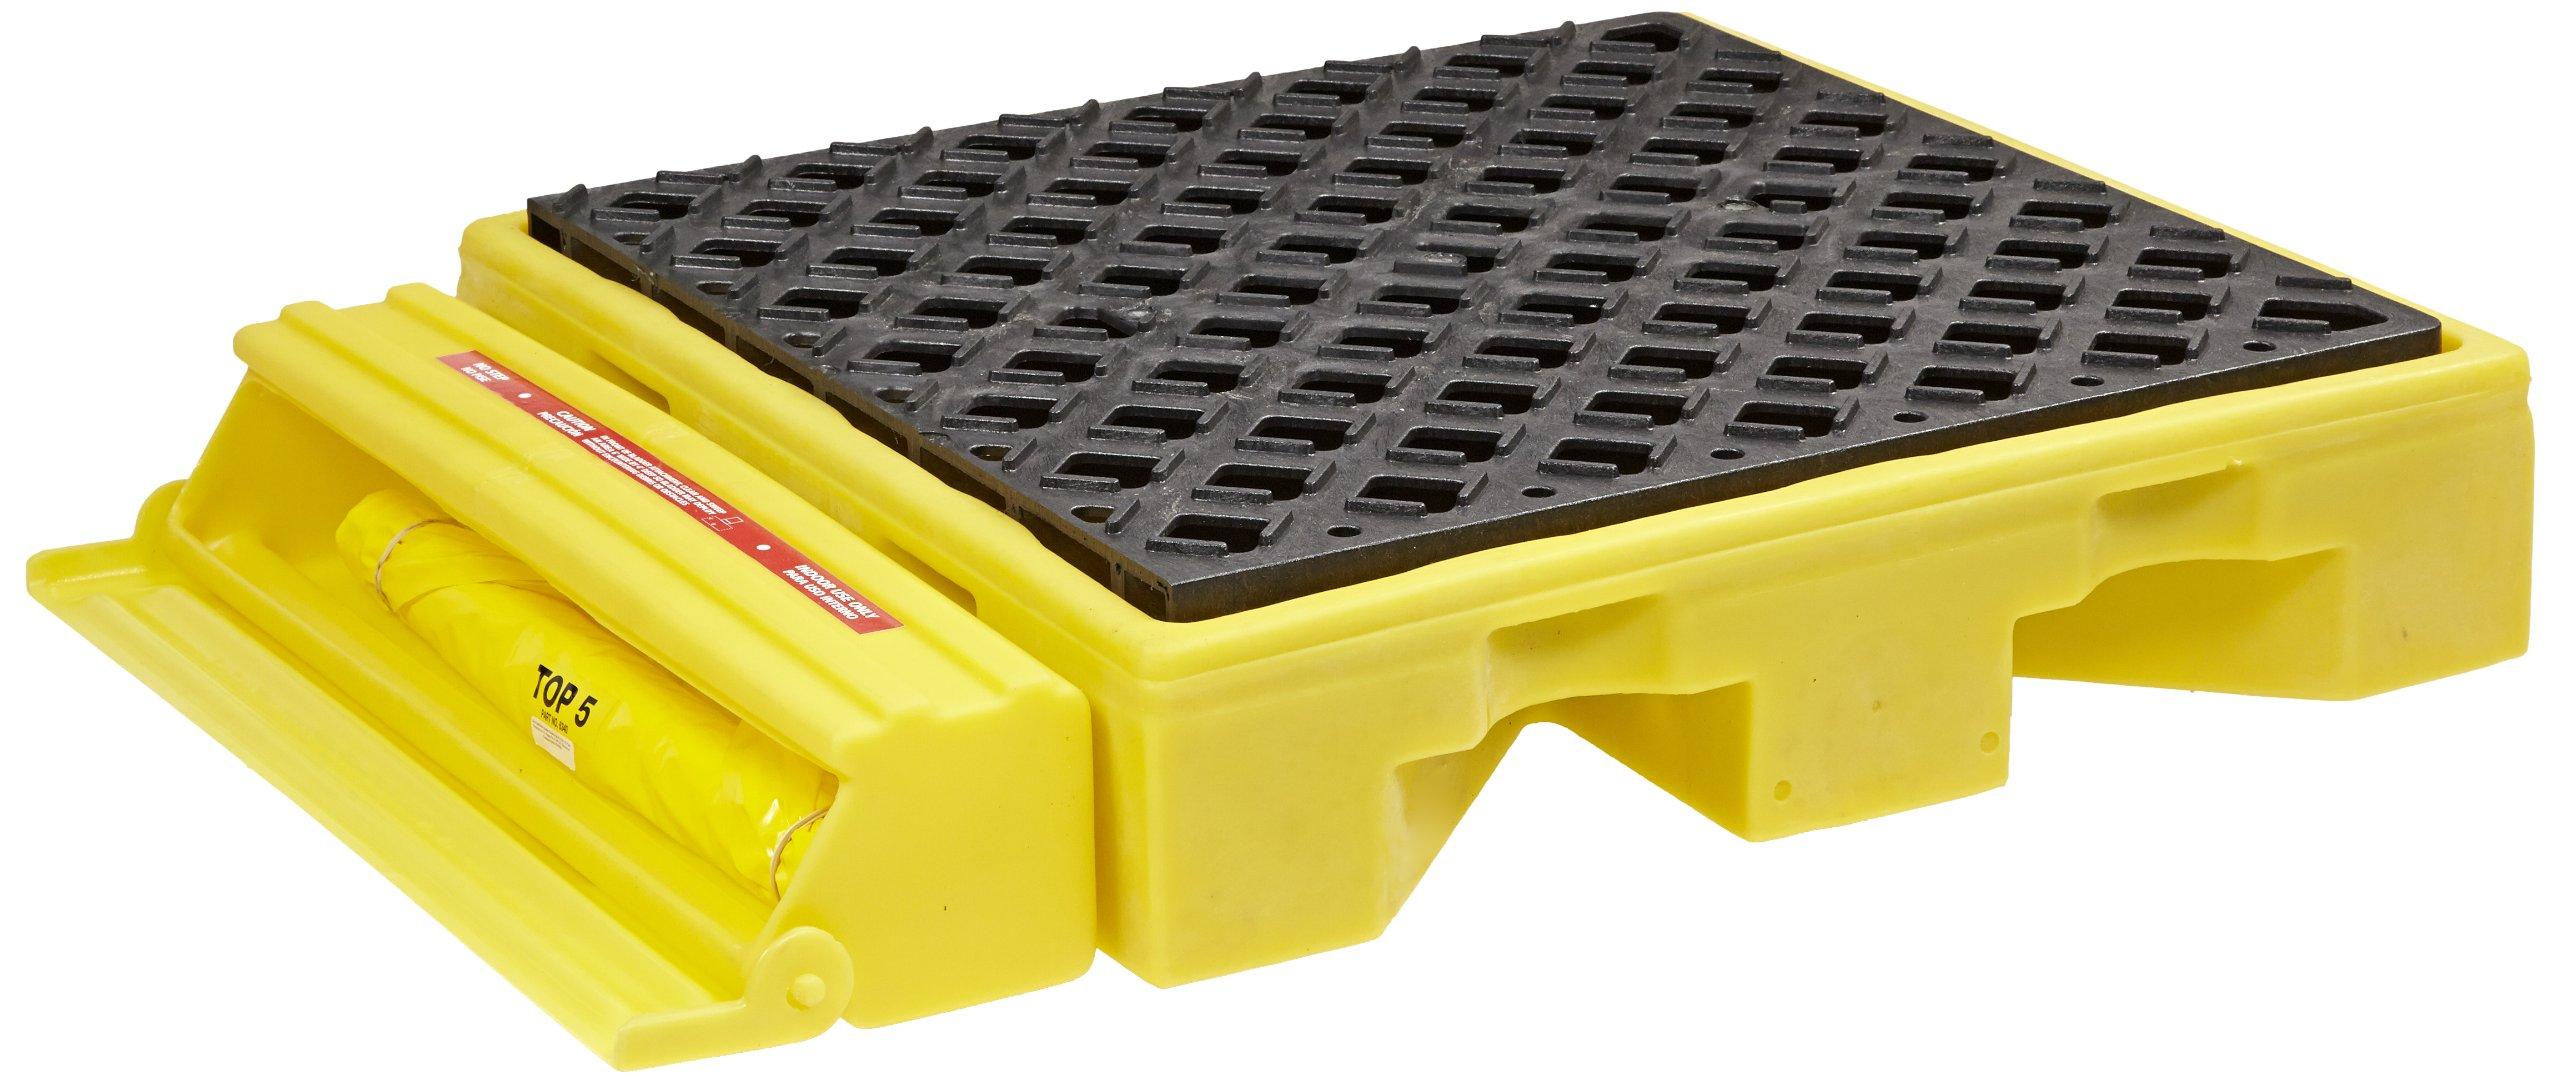 UltraTech 1320 Polyethylene Ultra-Spill Deck P1 Module Bladder System, 1 Drum 1500 lbs Capacity, 5 Year Warranty, Yellow